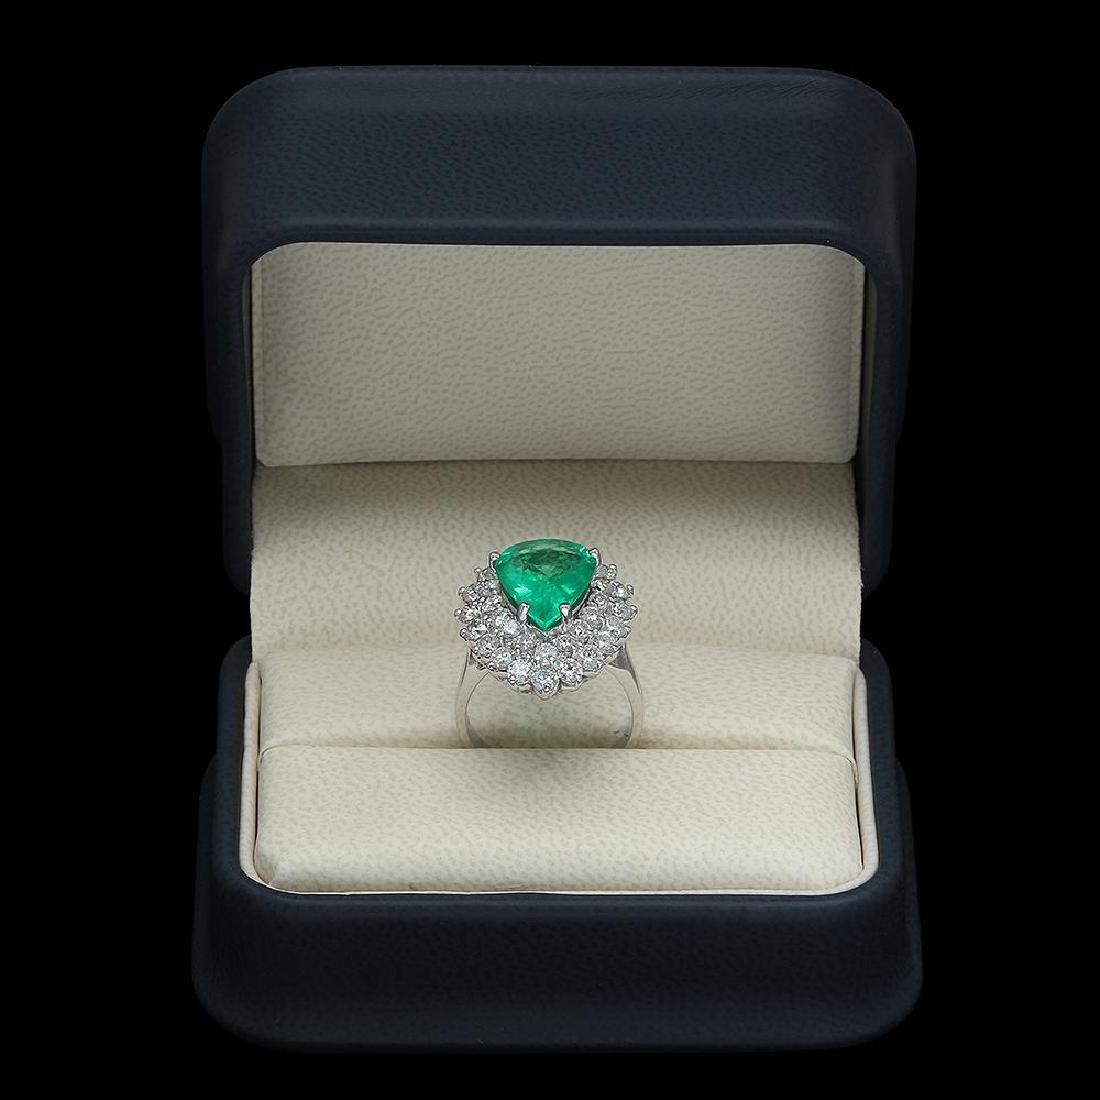 14K Gold 4.89 Emerald 2.65 Diamond Ring - 4